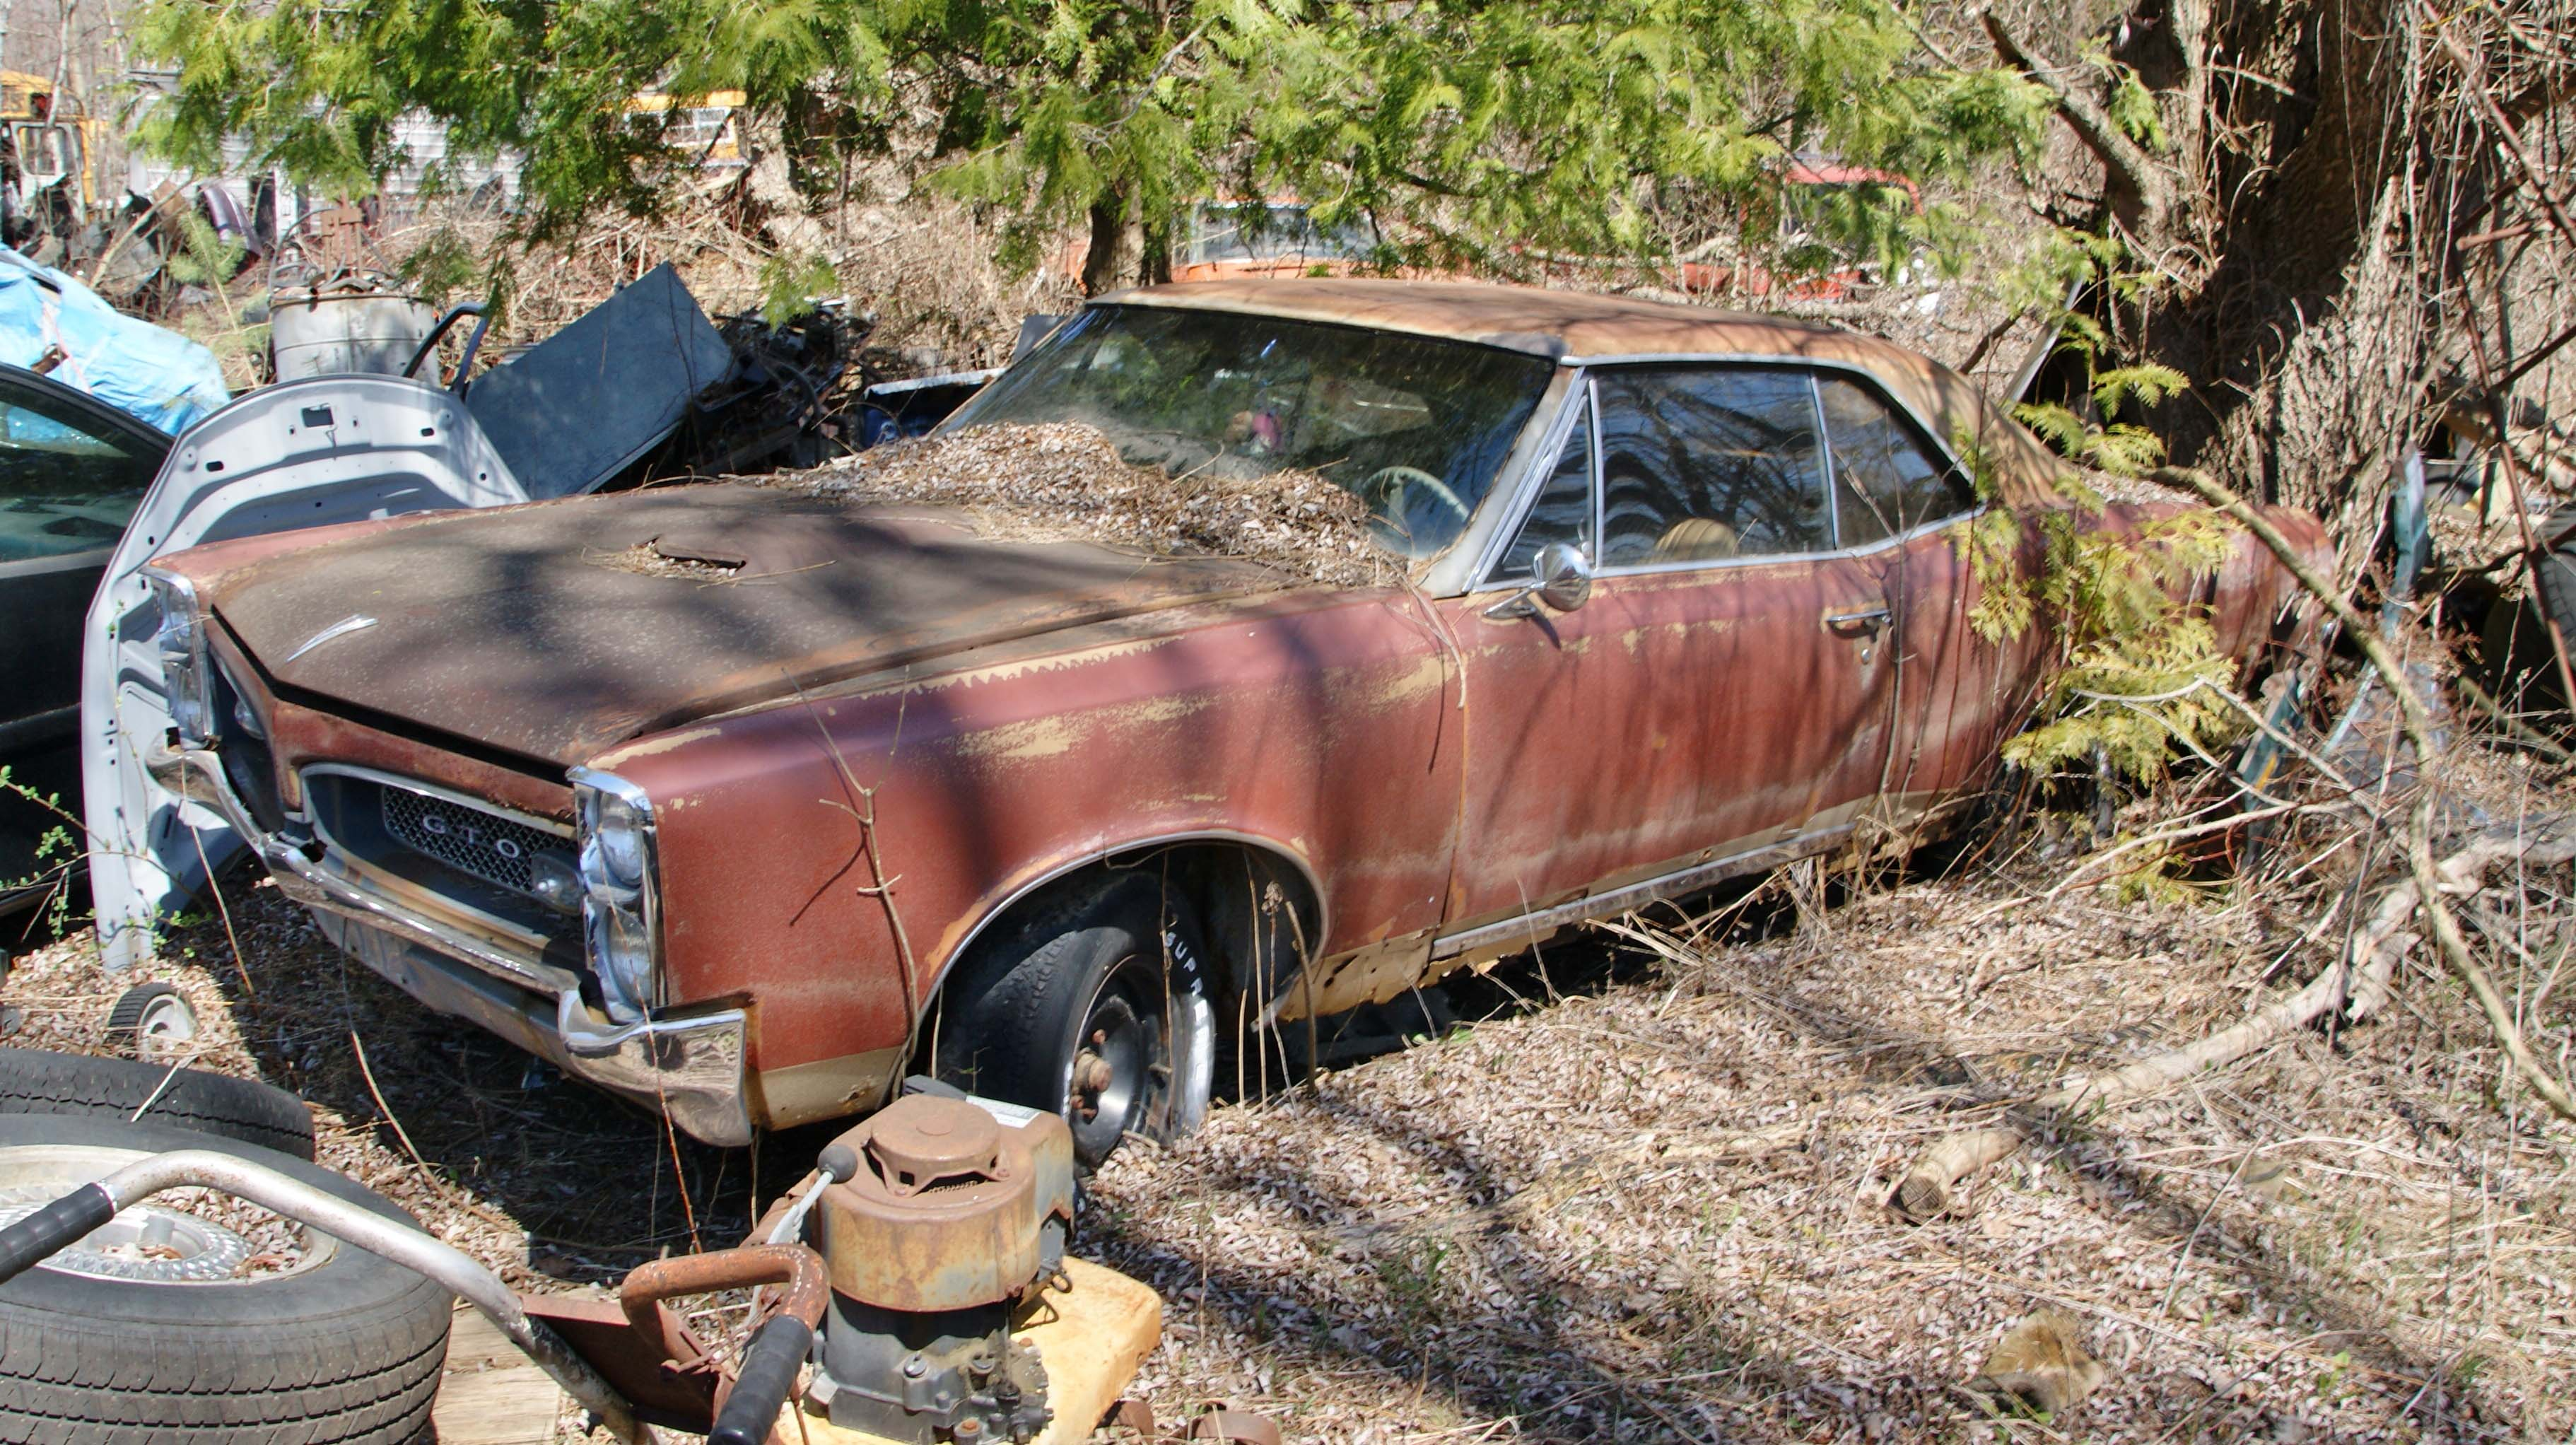 Michigan Junkyard Turns Up Some Buried Muscle Car Treasure - Hot Rod ...